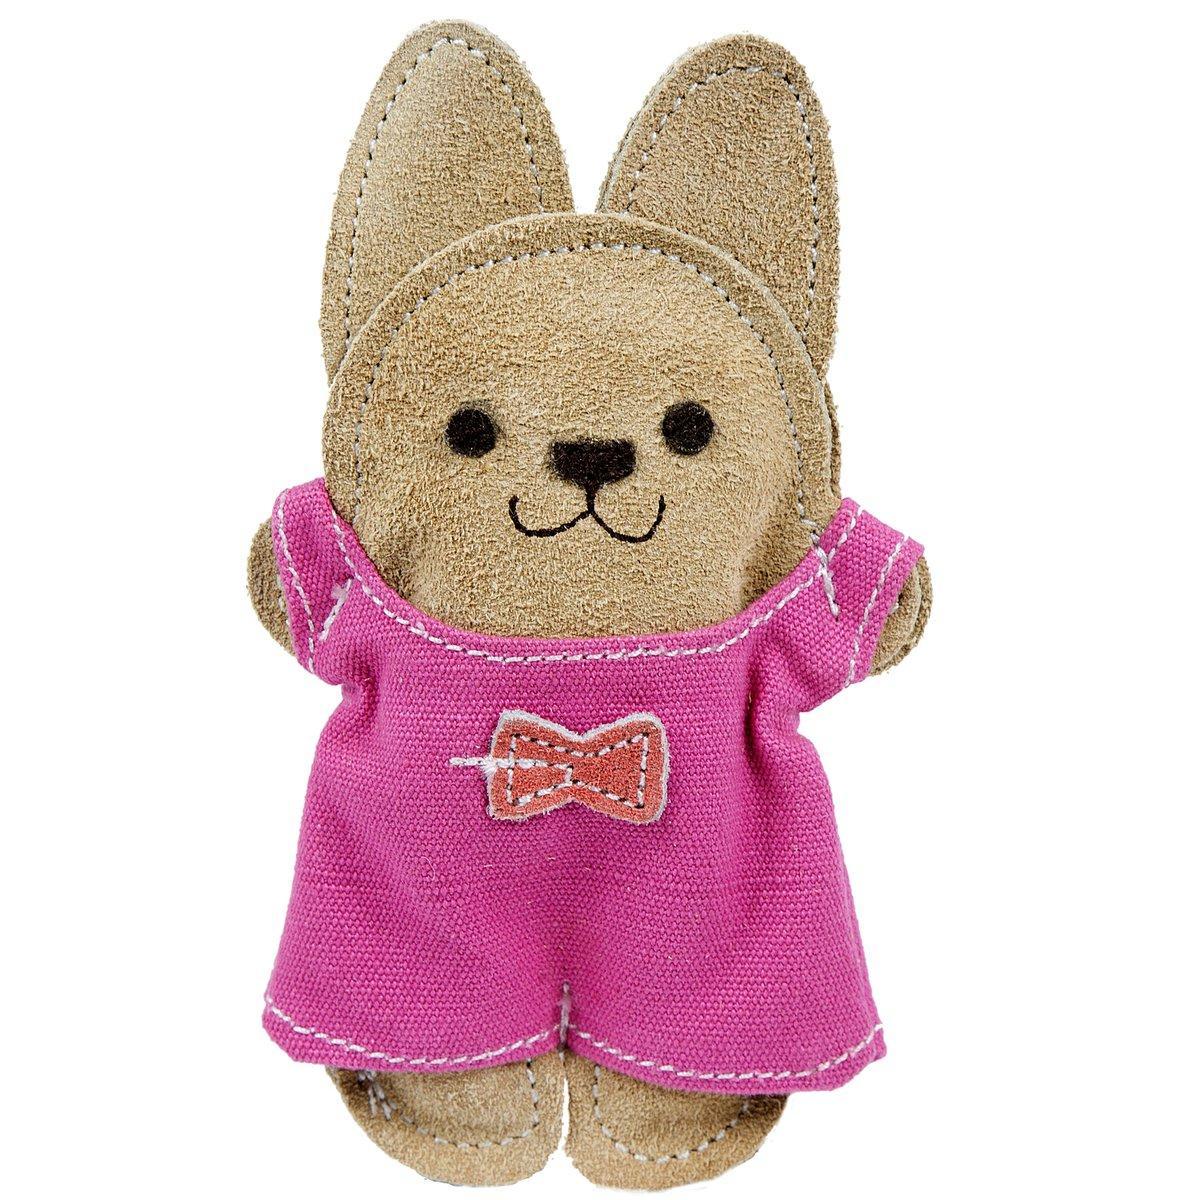 HuggleHounds Big-Wee Bunny Dog Toy